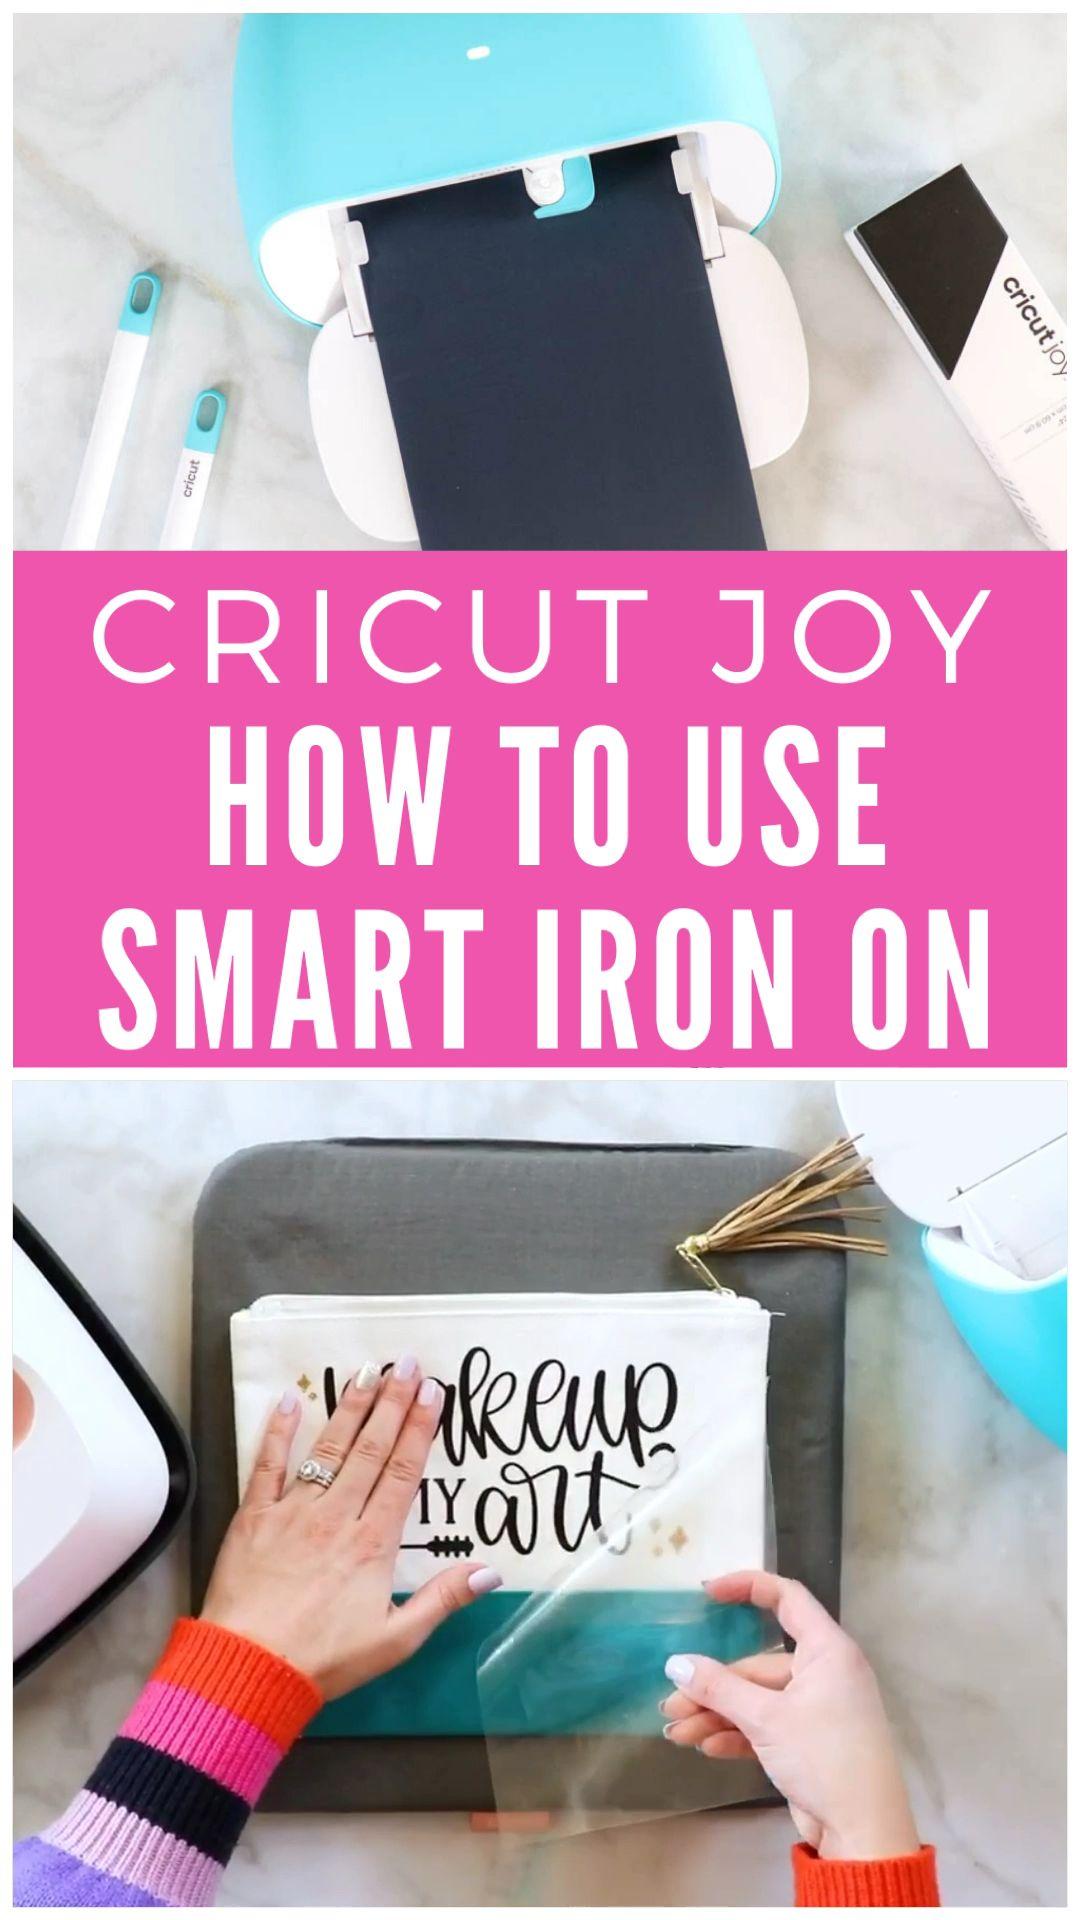 , How to cut and apply Cricut Joy Smart Iron-On, Crafts To Sell Blog, Crafts To Sell Blog